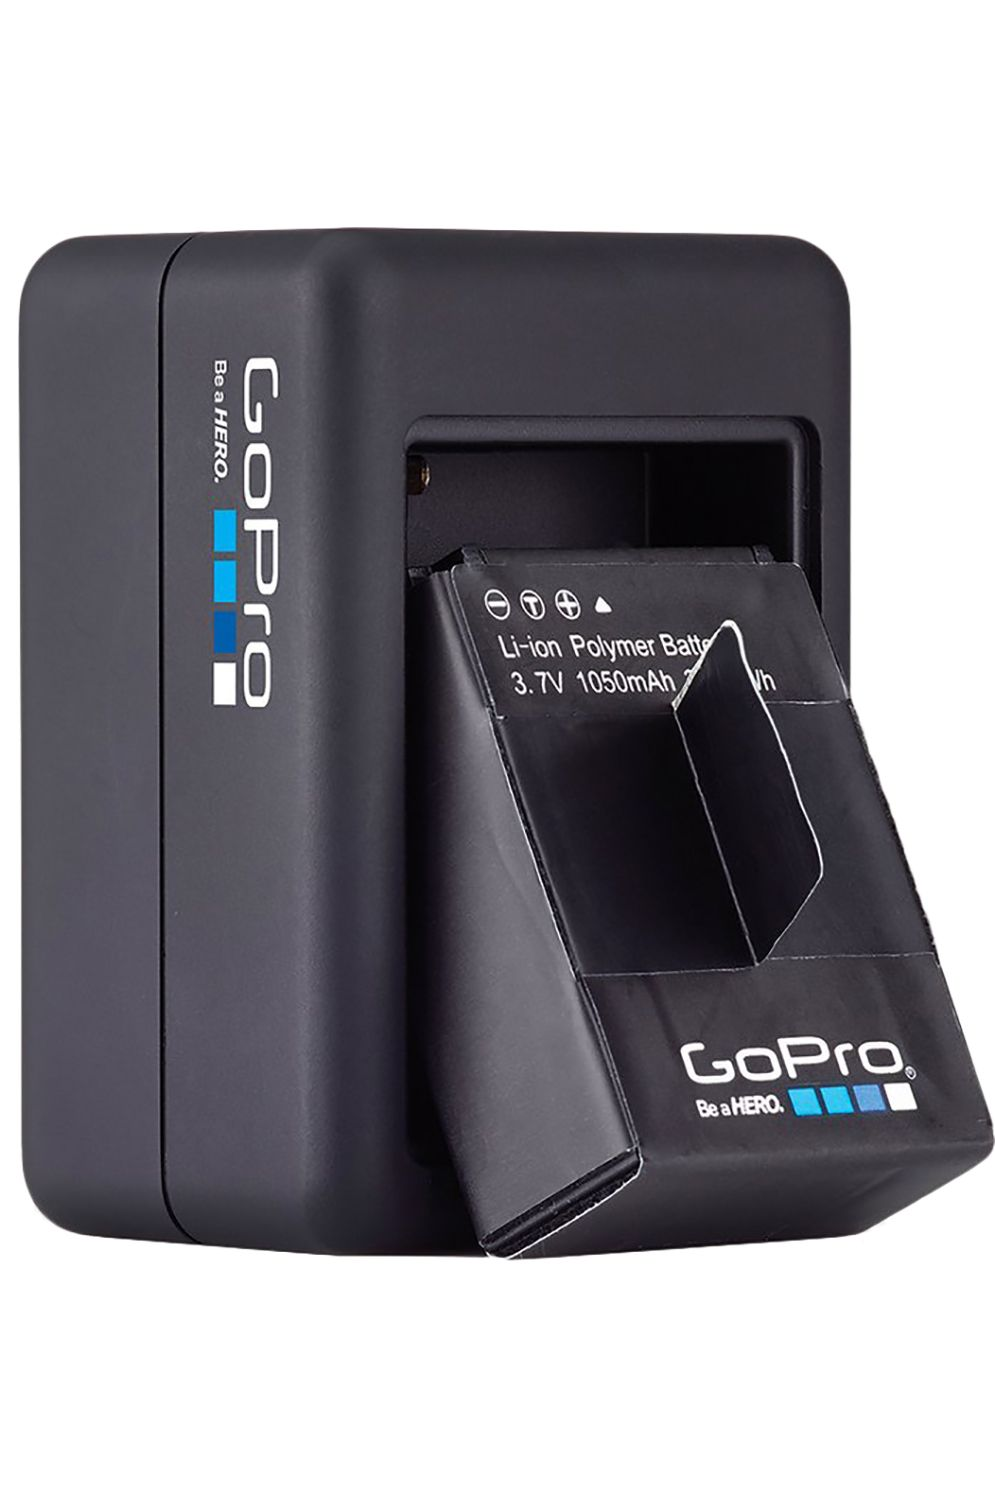 Bateria/Carregador GoPro GOPRO Assorted